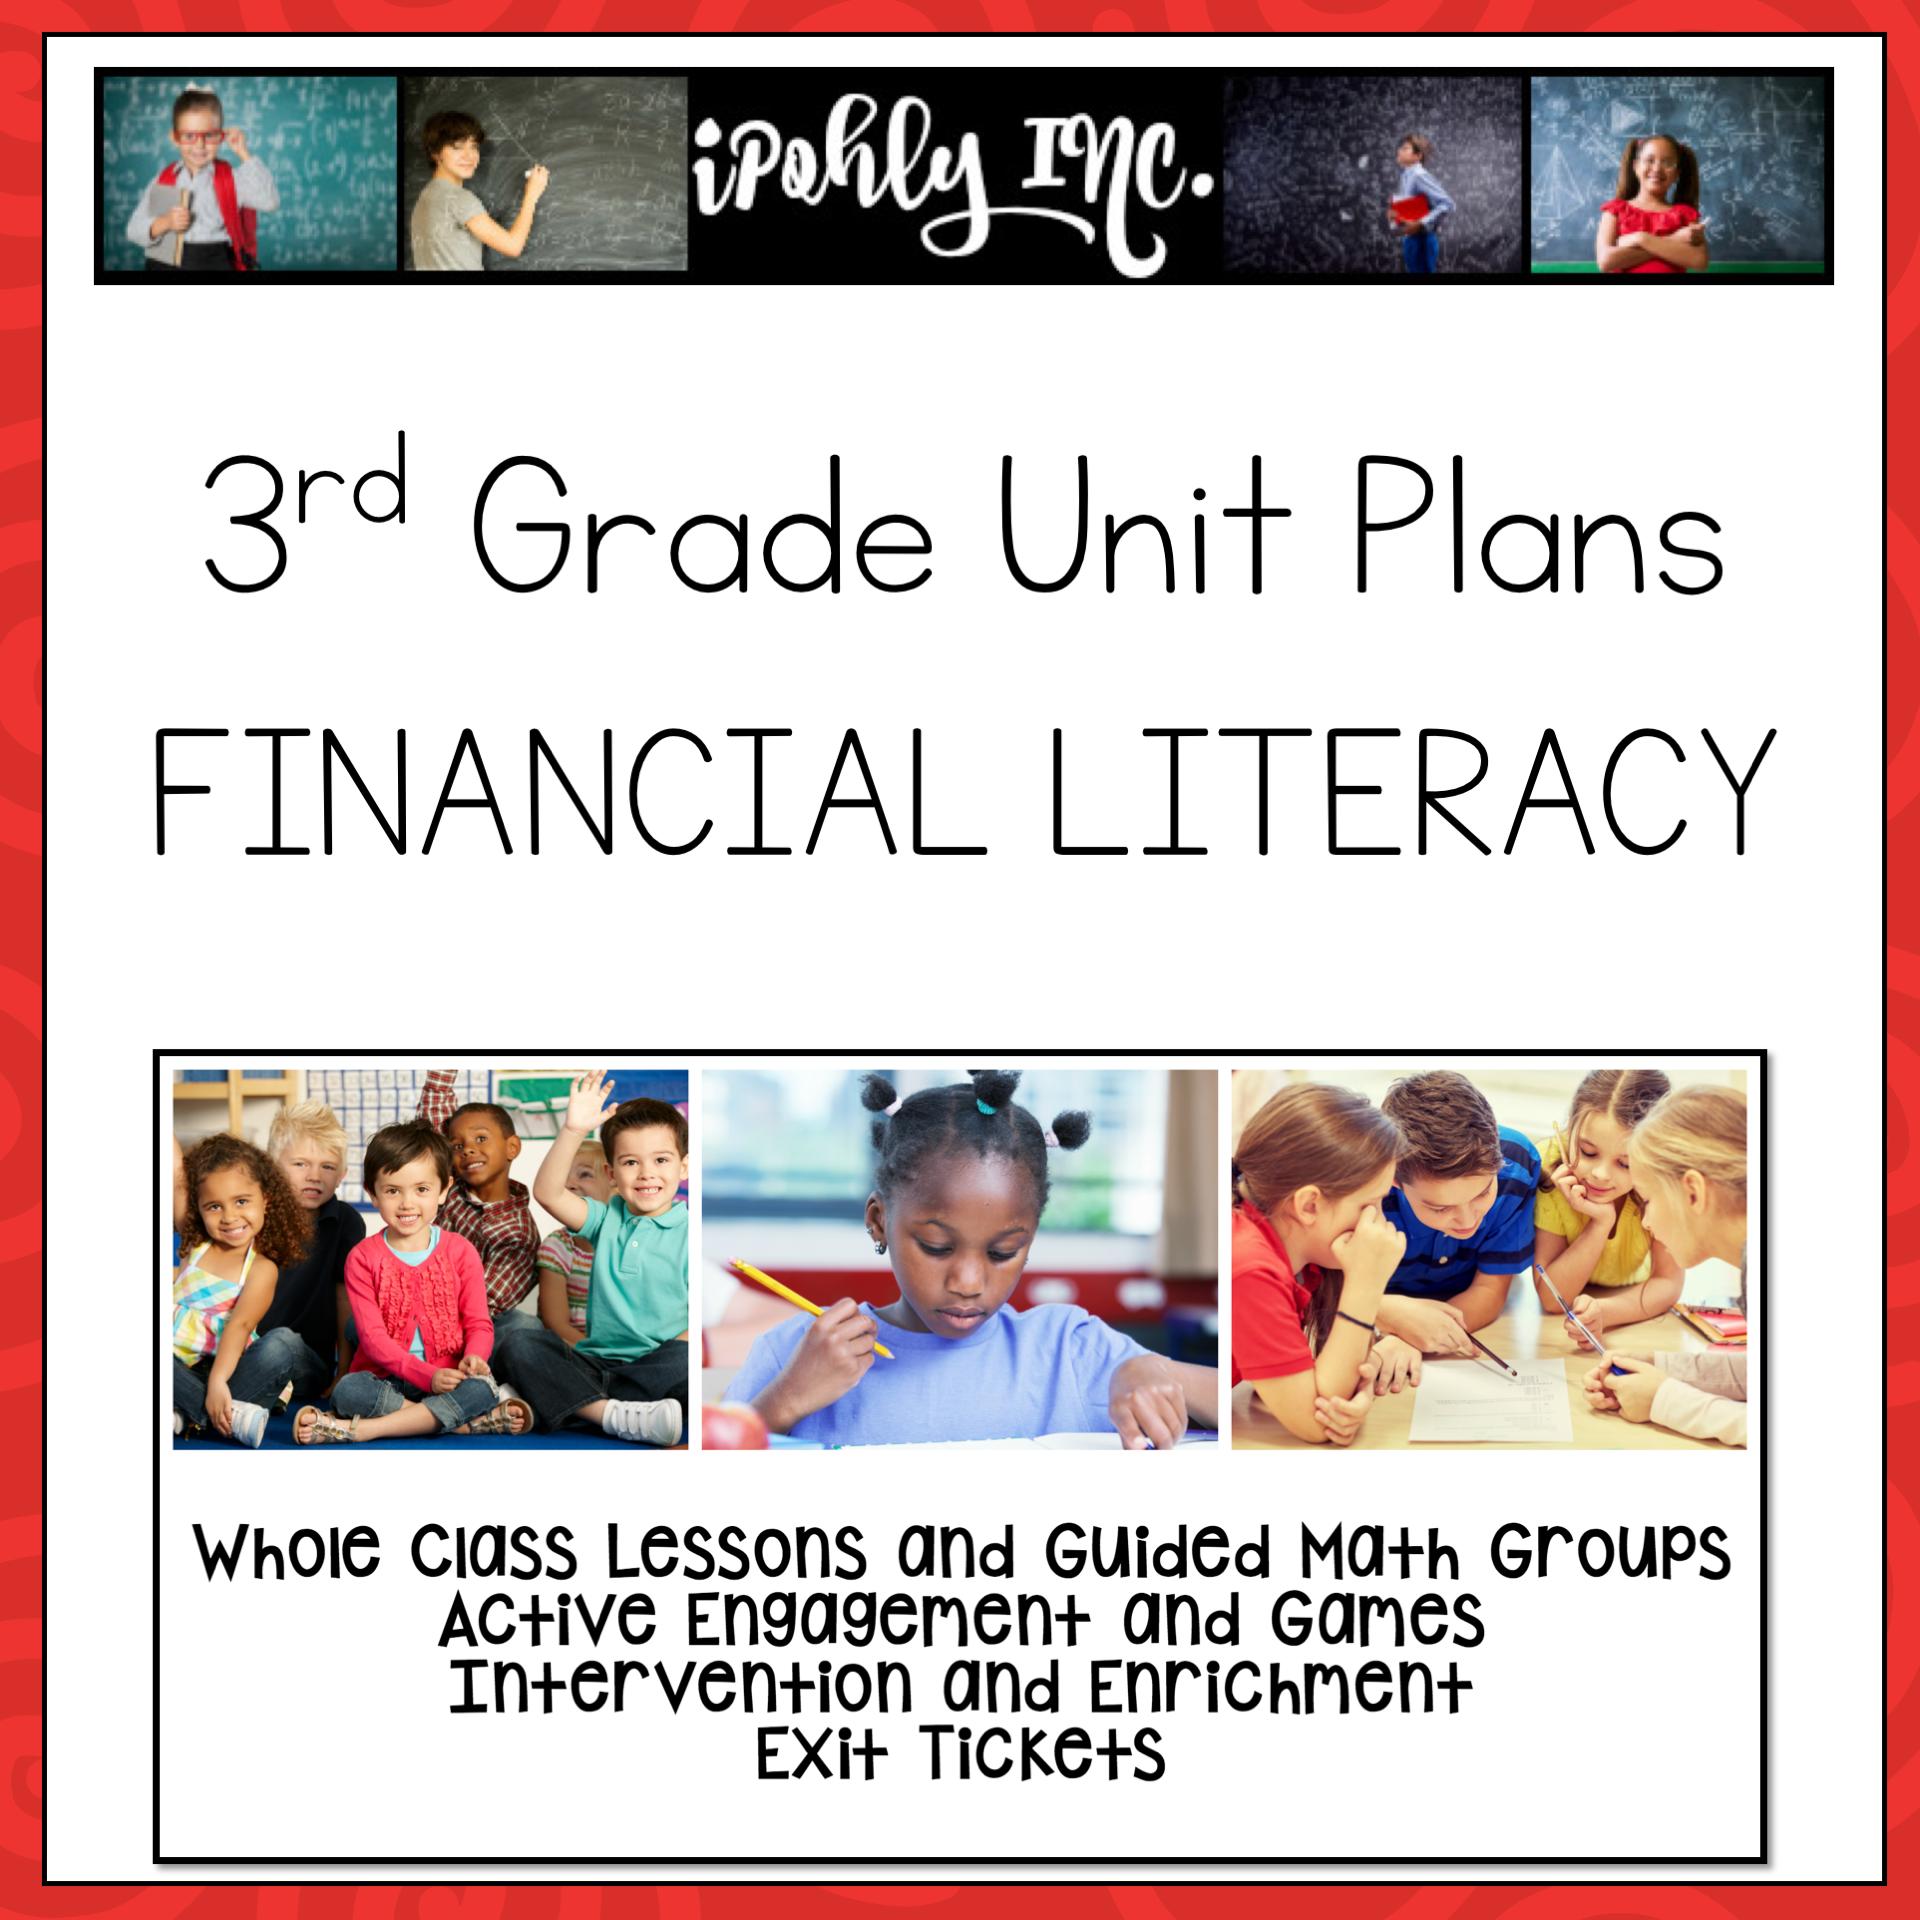 3rd Grade Lesson Plans Financial Literacy 3 9a 3 9b 3 9c 3